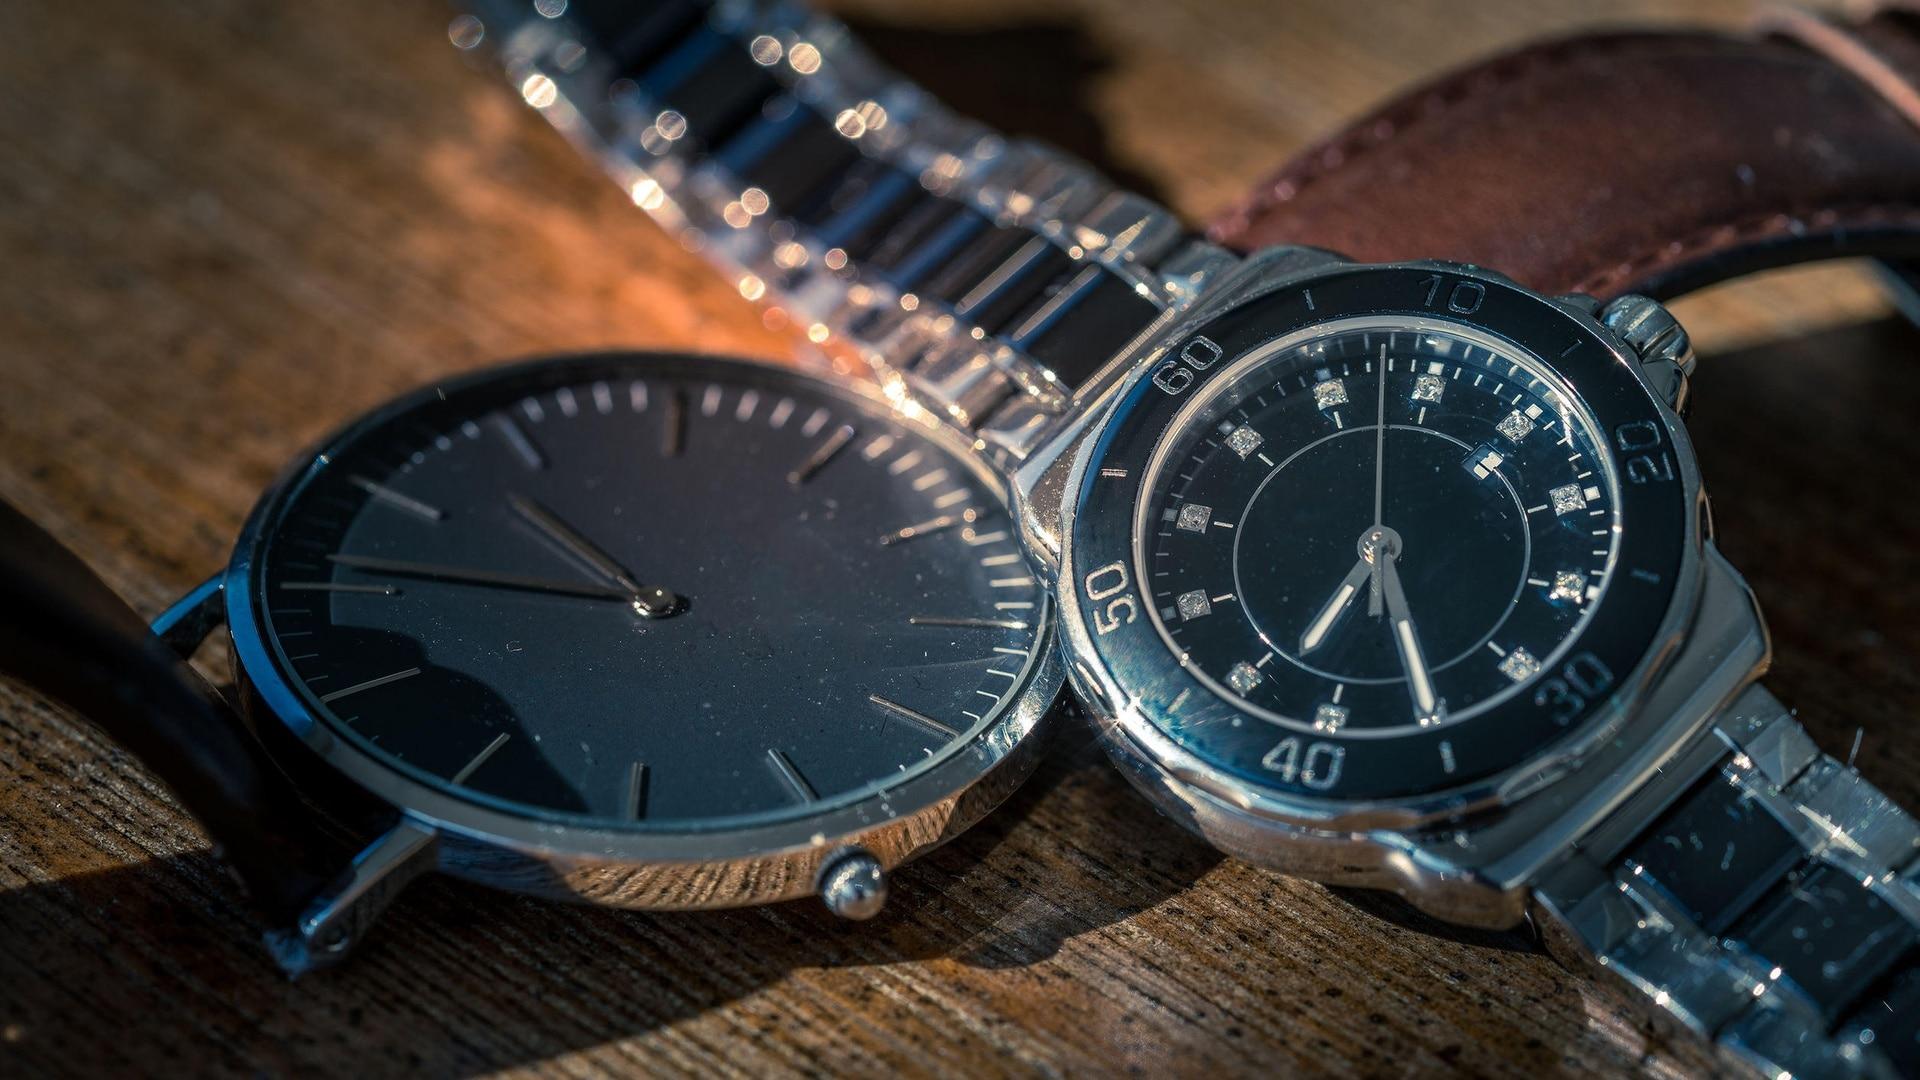 Los Relojes De Segunda Mano Arrasan En Internet Swi Swissinfo Ch